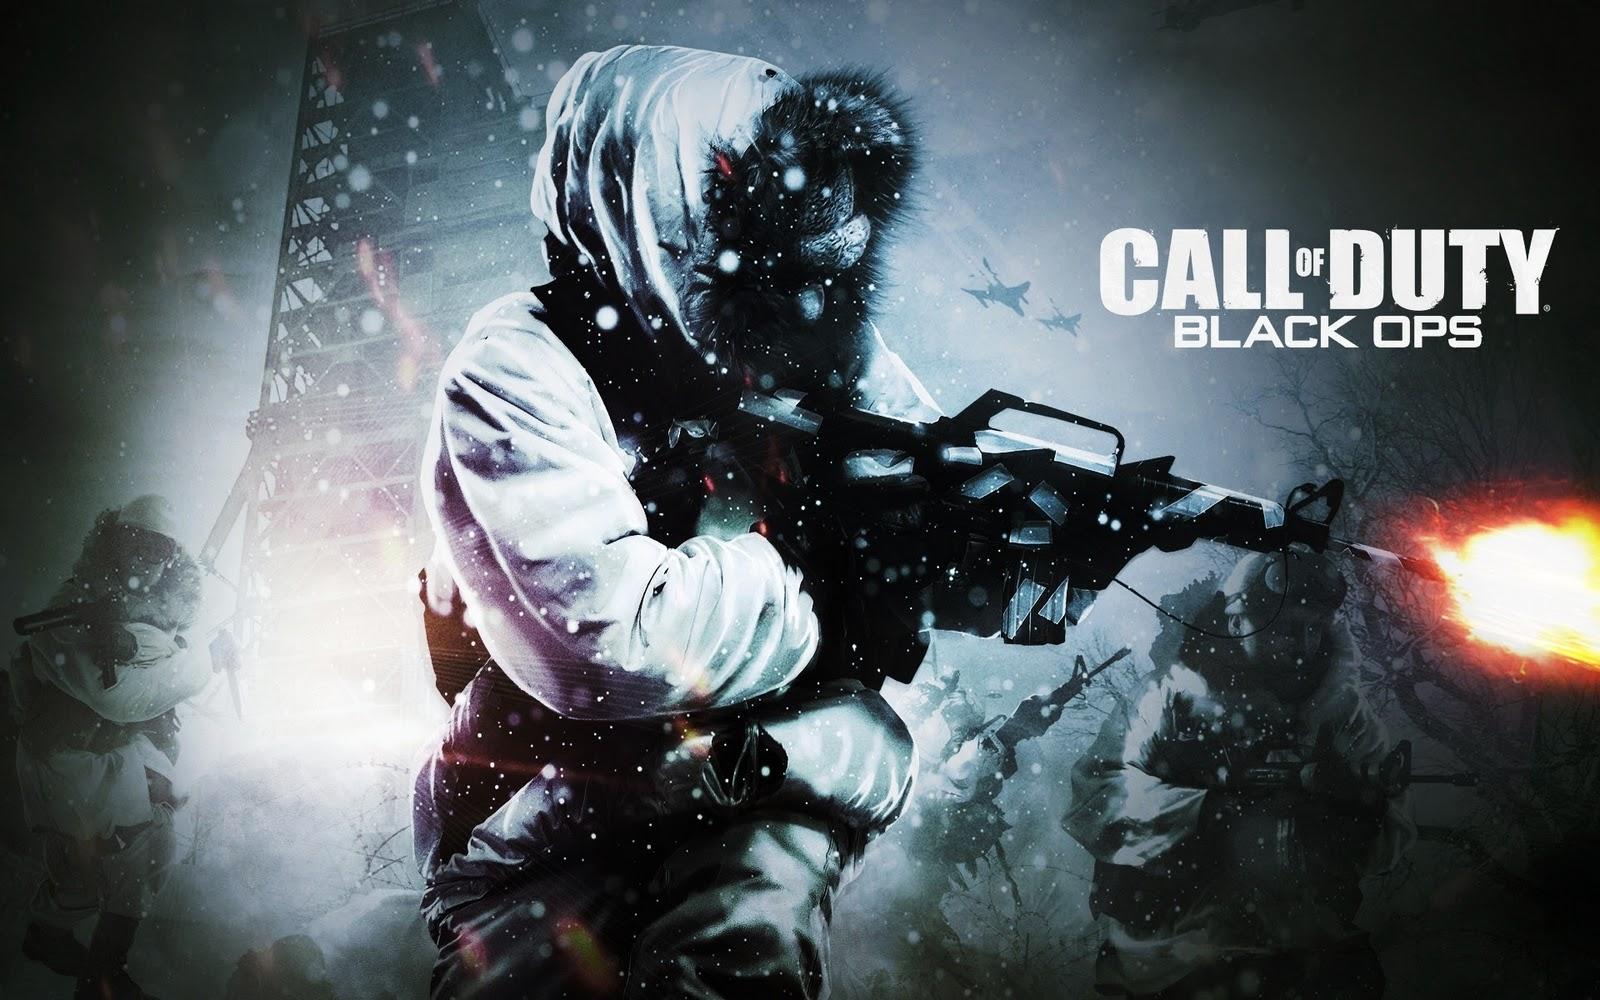 Download Foto Wallpaper Keren - Call Of Duty Black Ops , HD Wallpaper & Backgrounds